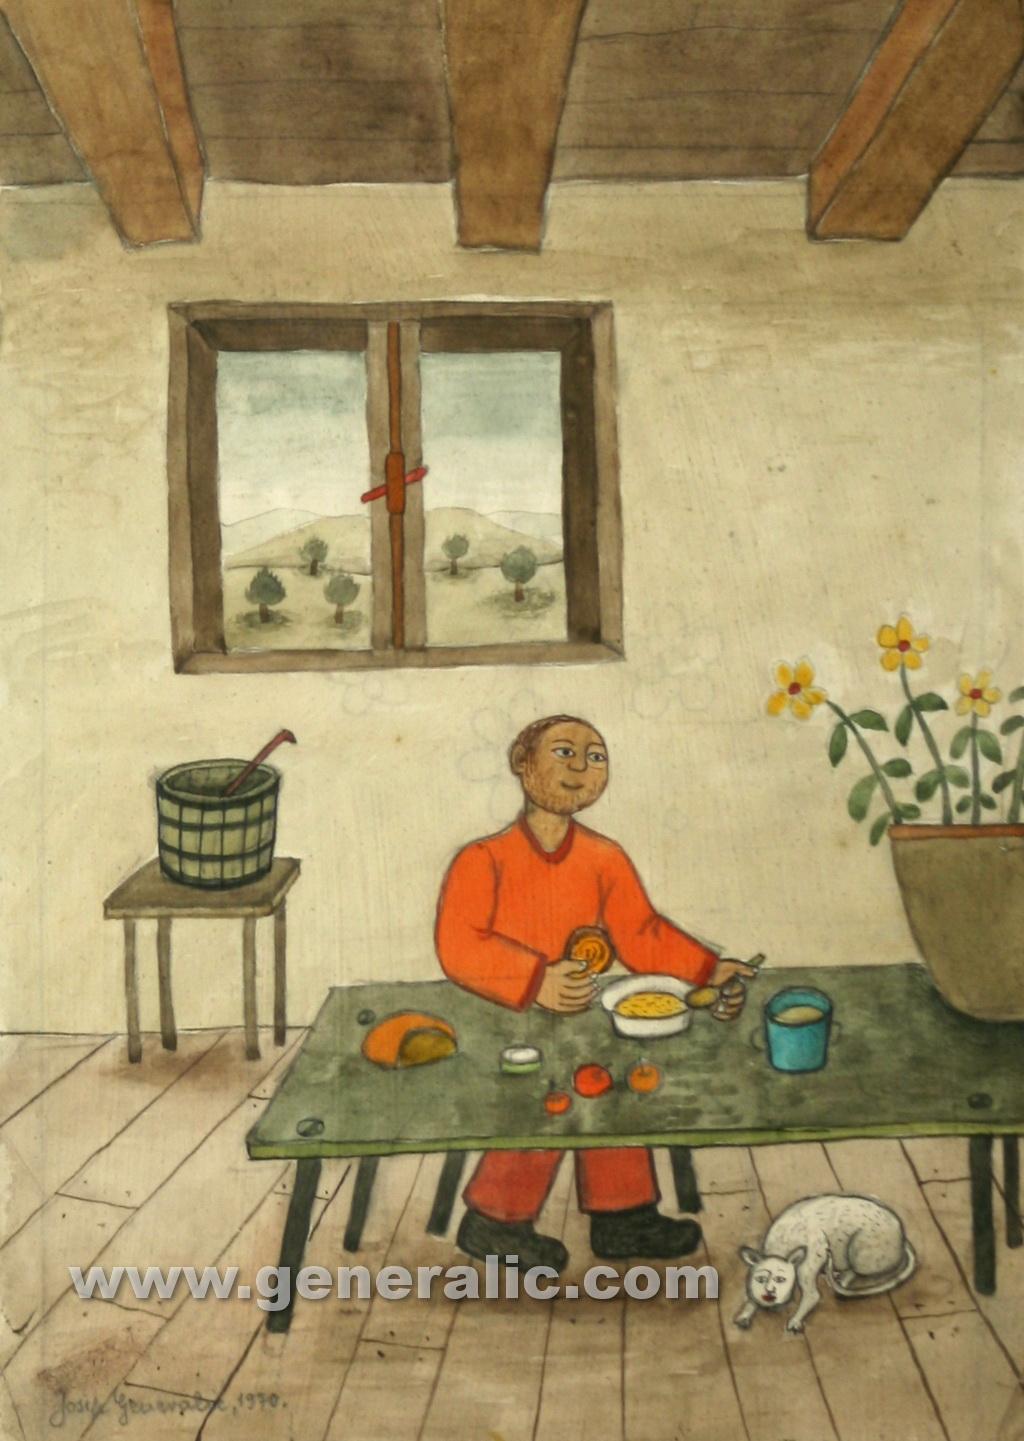 Josip Generalic, 1970, Man at lunch, watercolour